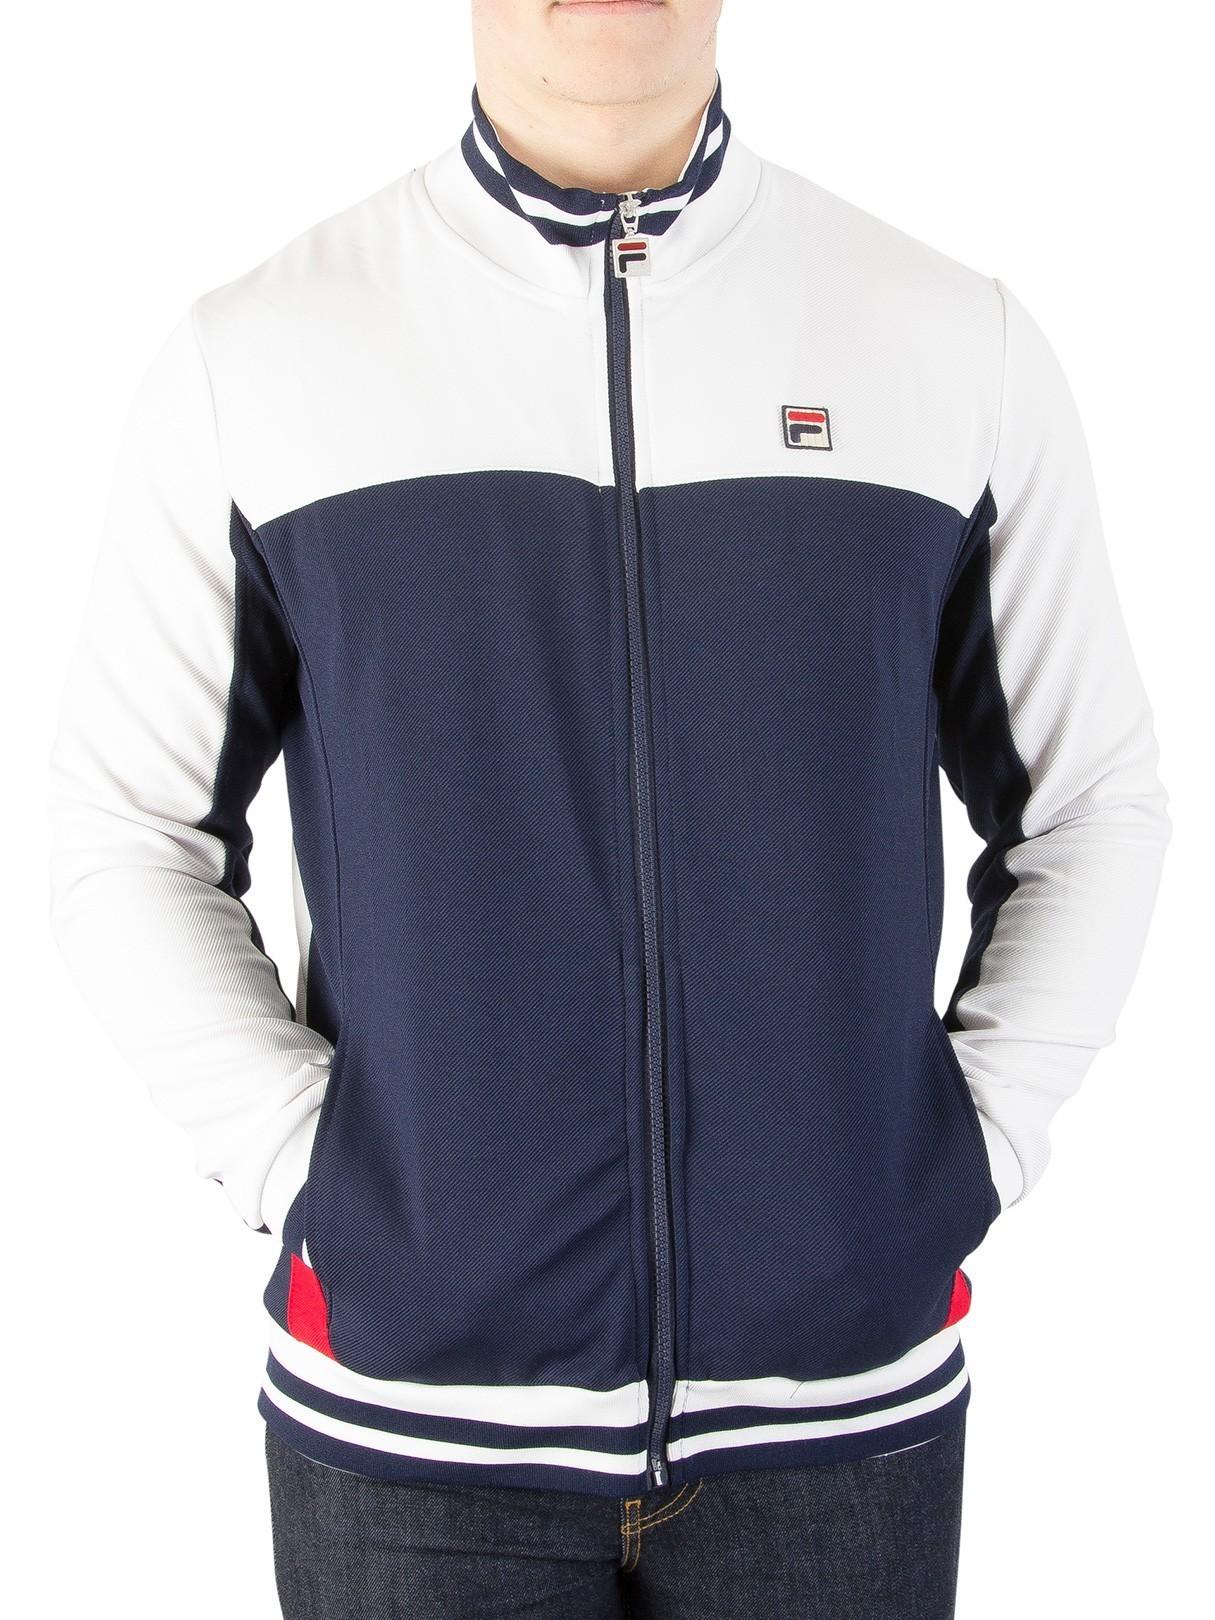 fcb43c2ecc355 Fila Vintage White/Peacoat/Red Tiebreaker Track Jacket | Standout